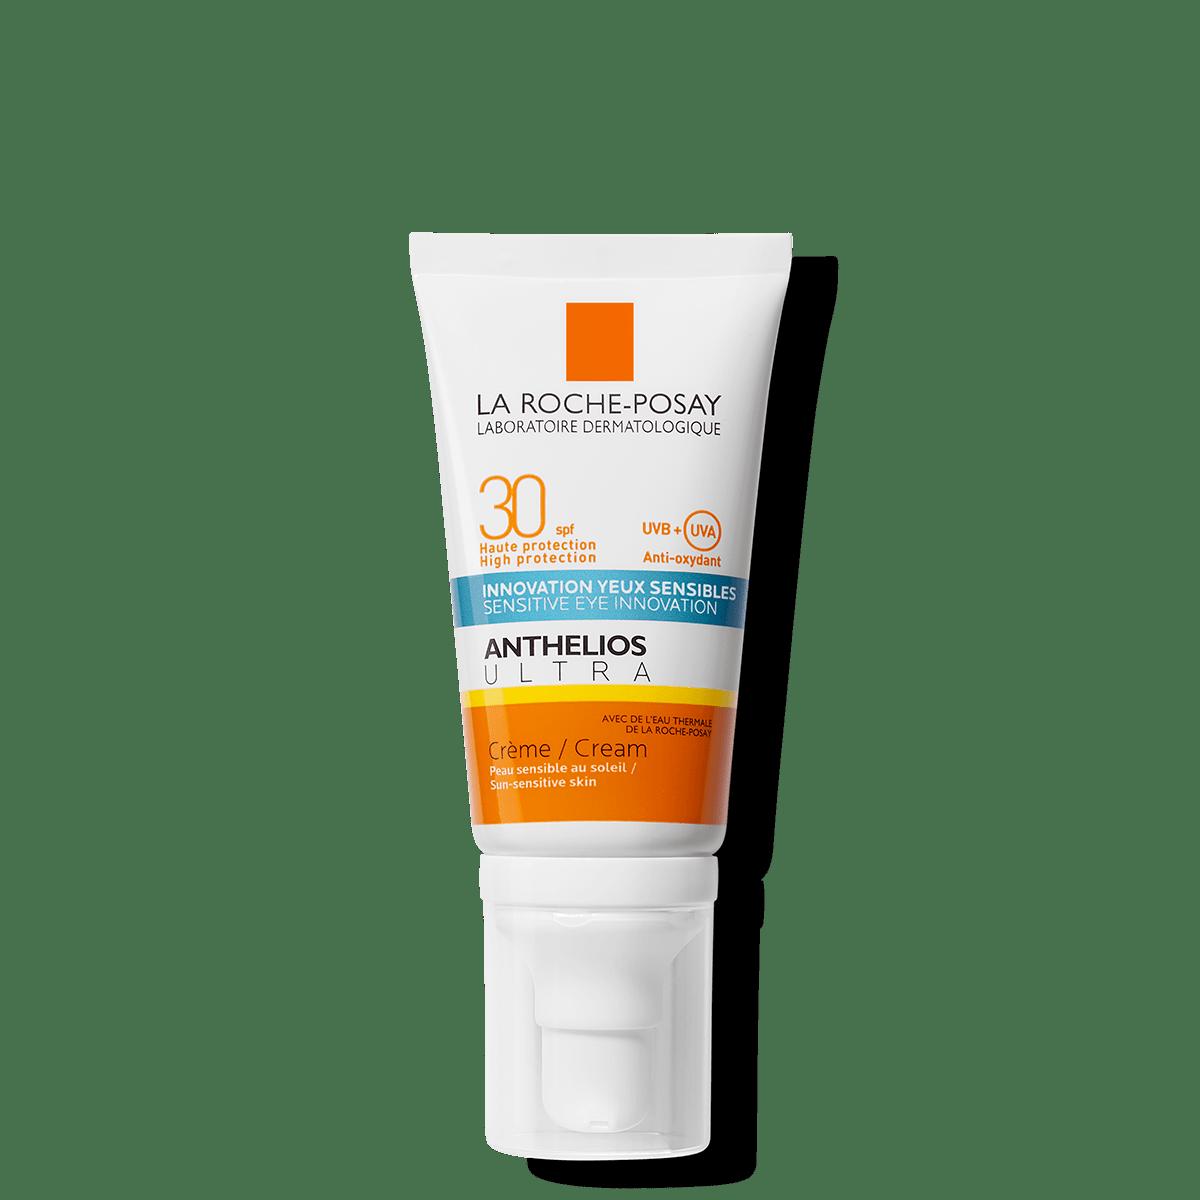 La Roche Posay ProductPage Sun Anthelios Ultra Face Cream Spf30 50ml 3